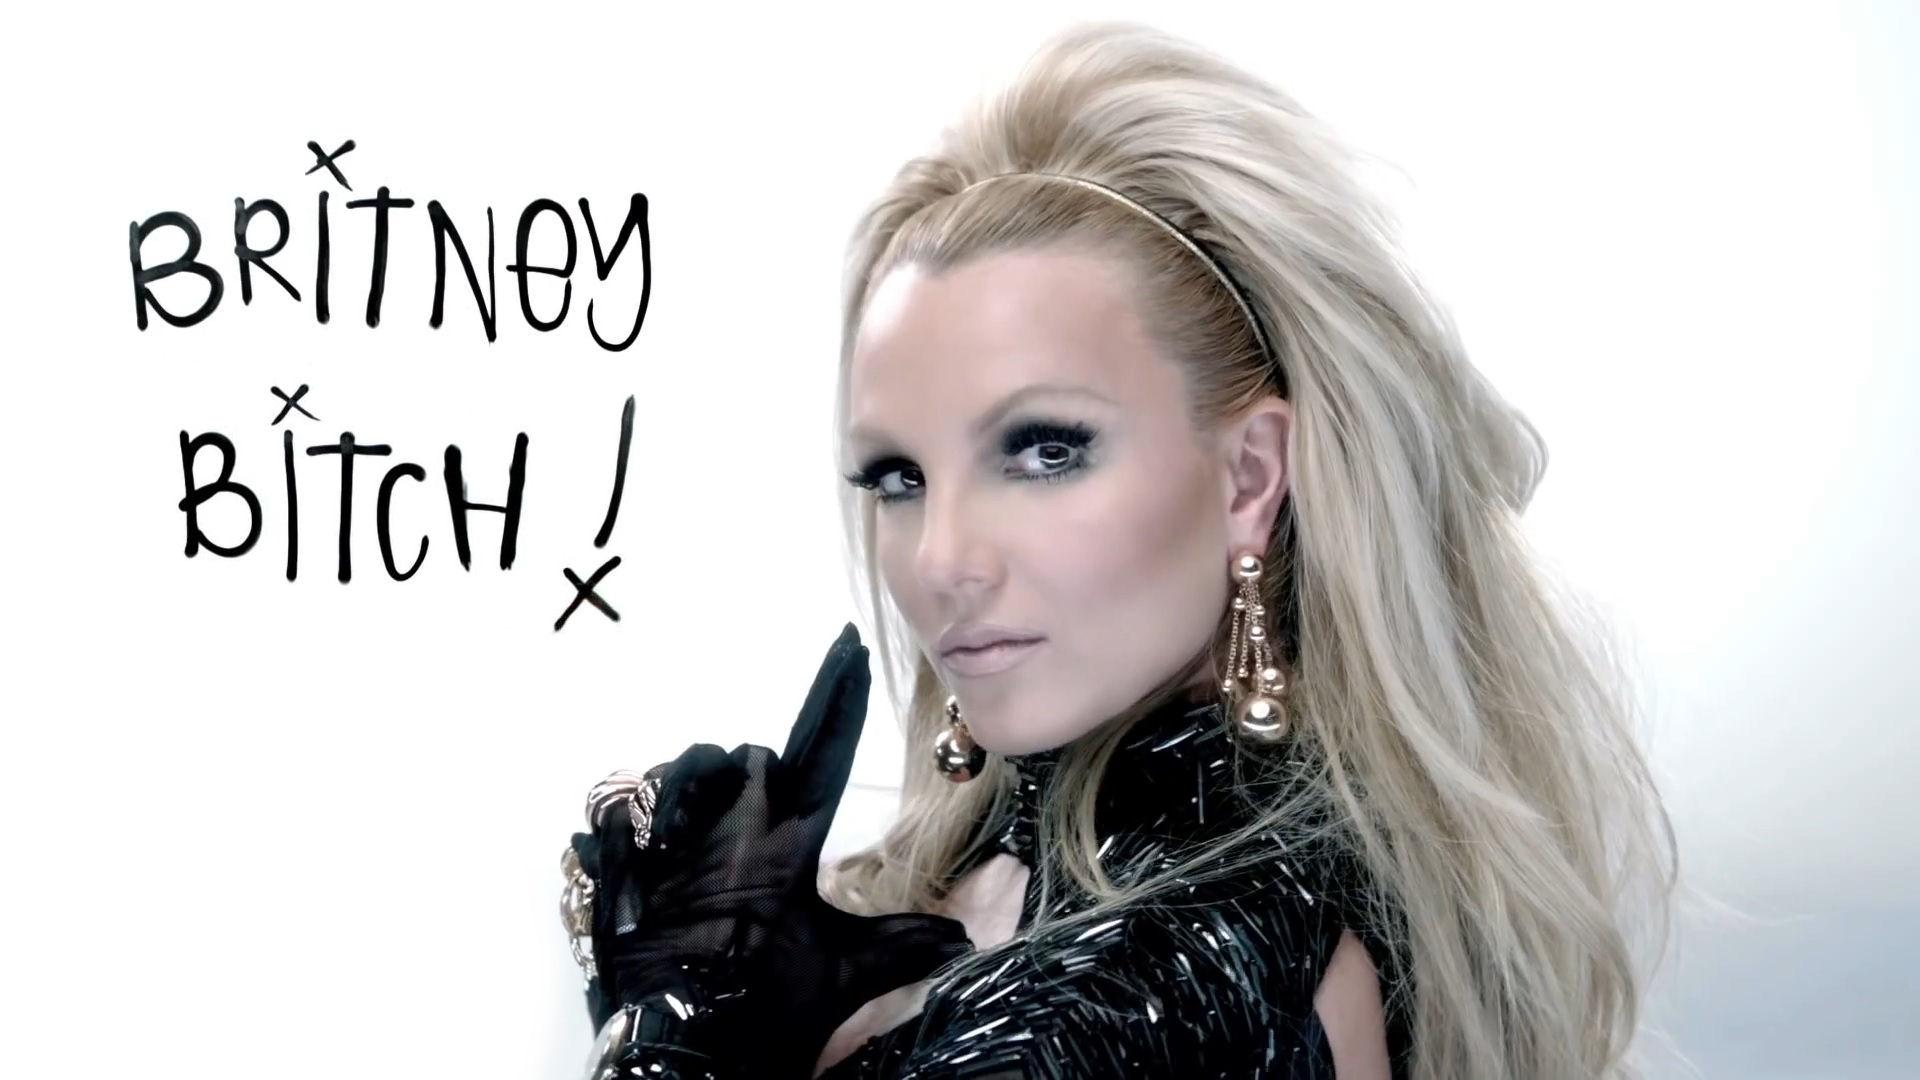 THE CELEBRITY APPRENTICE 2: [OT STARS EDITION] - PORTAFOLIOS (Pag. 45/46) It-s-Britney-B-ch-britney-spears-35928325-1920-1080